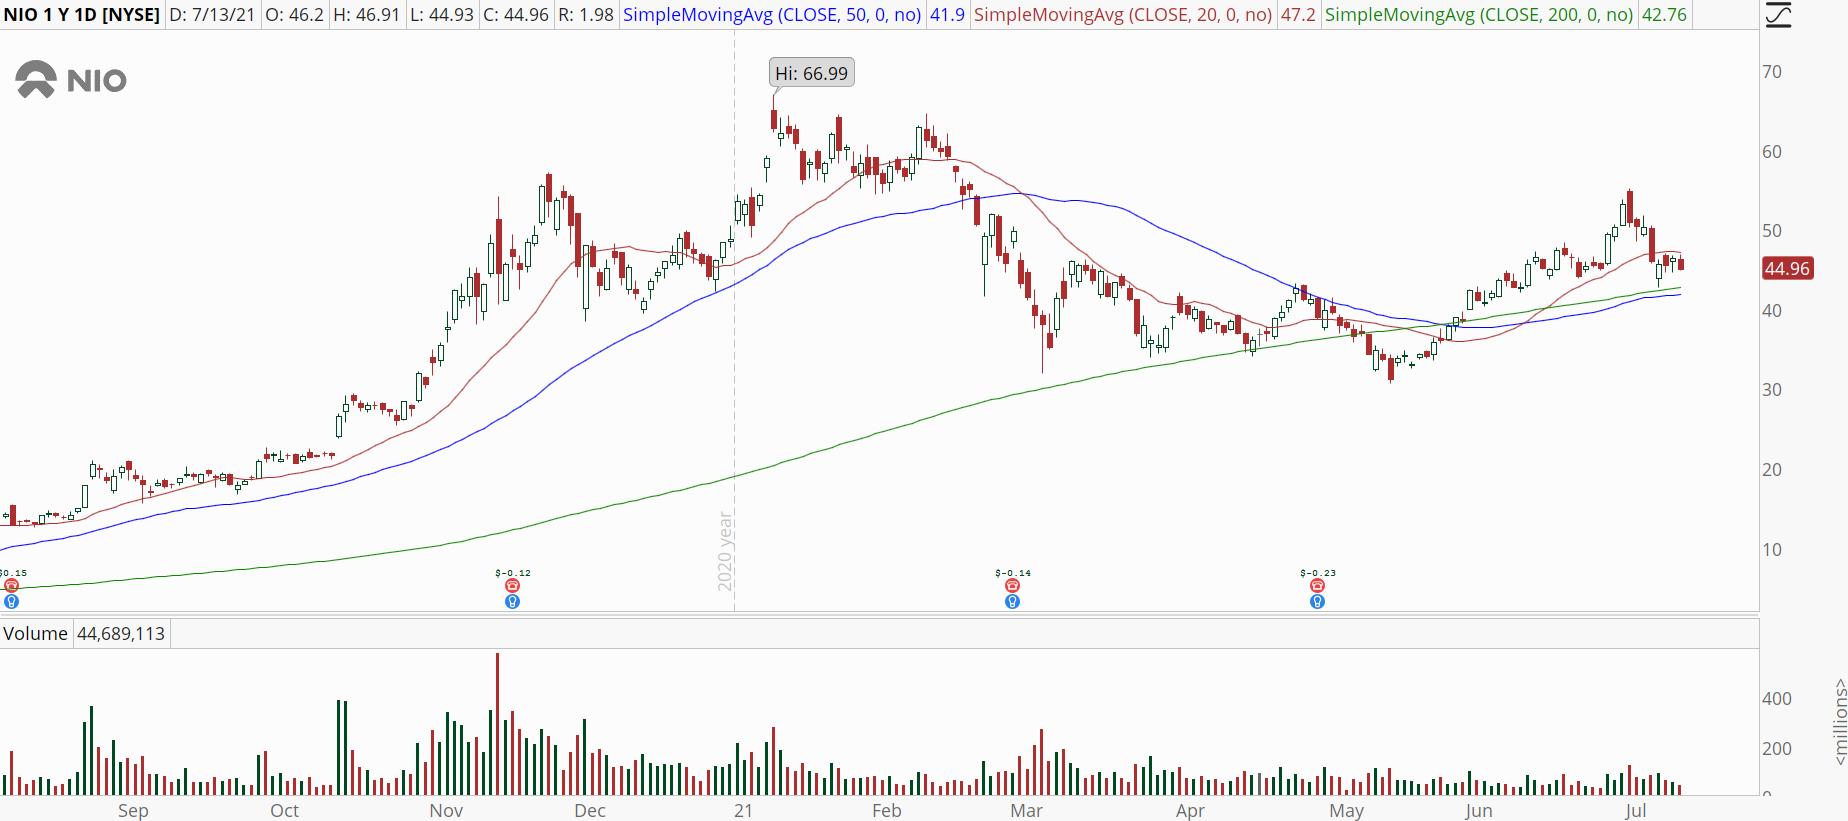 Nio (NIO) stock daily chart with bull retracement